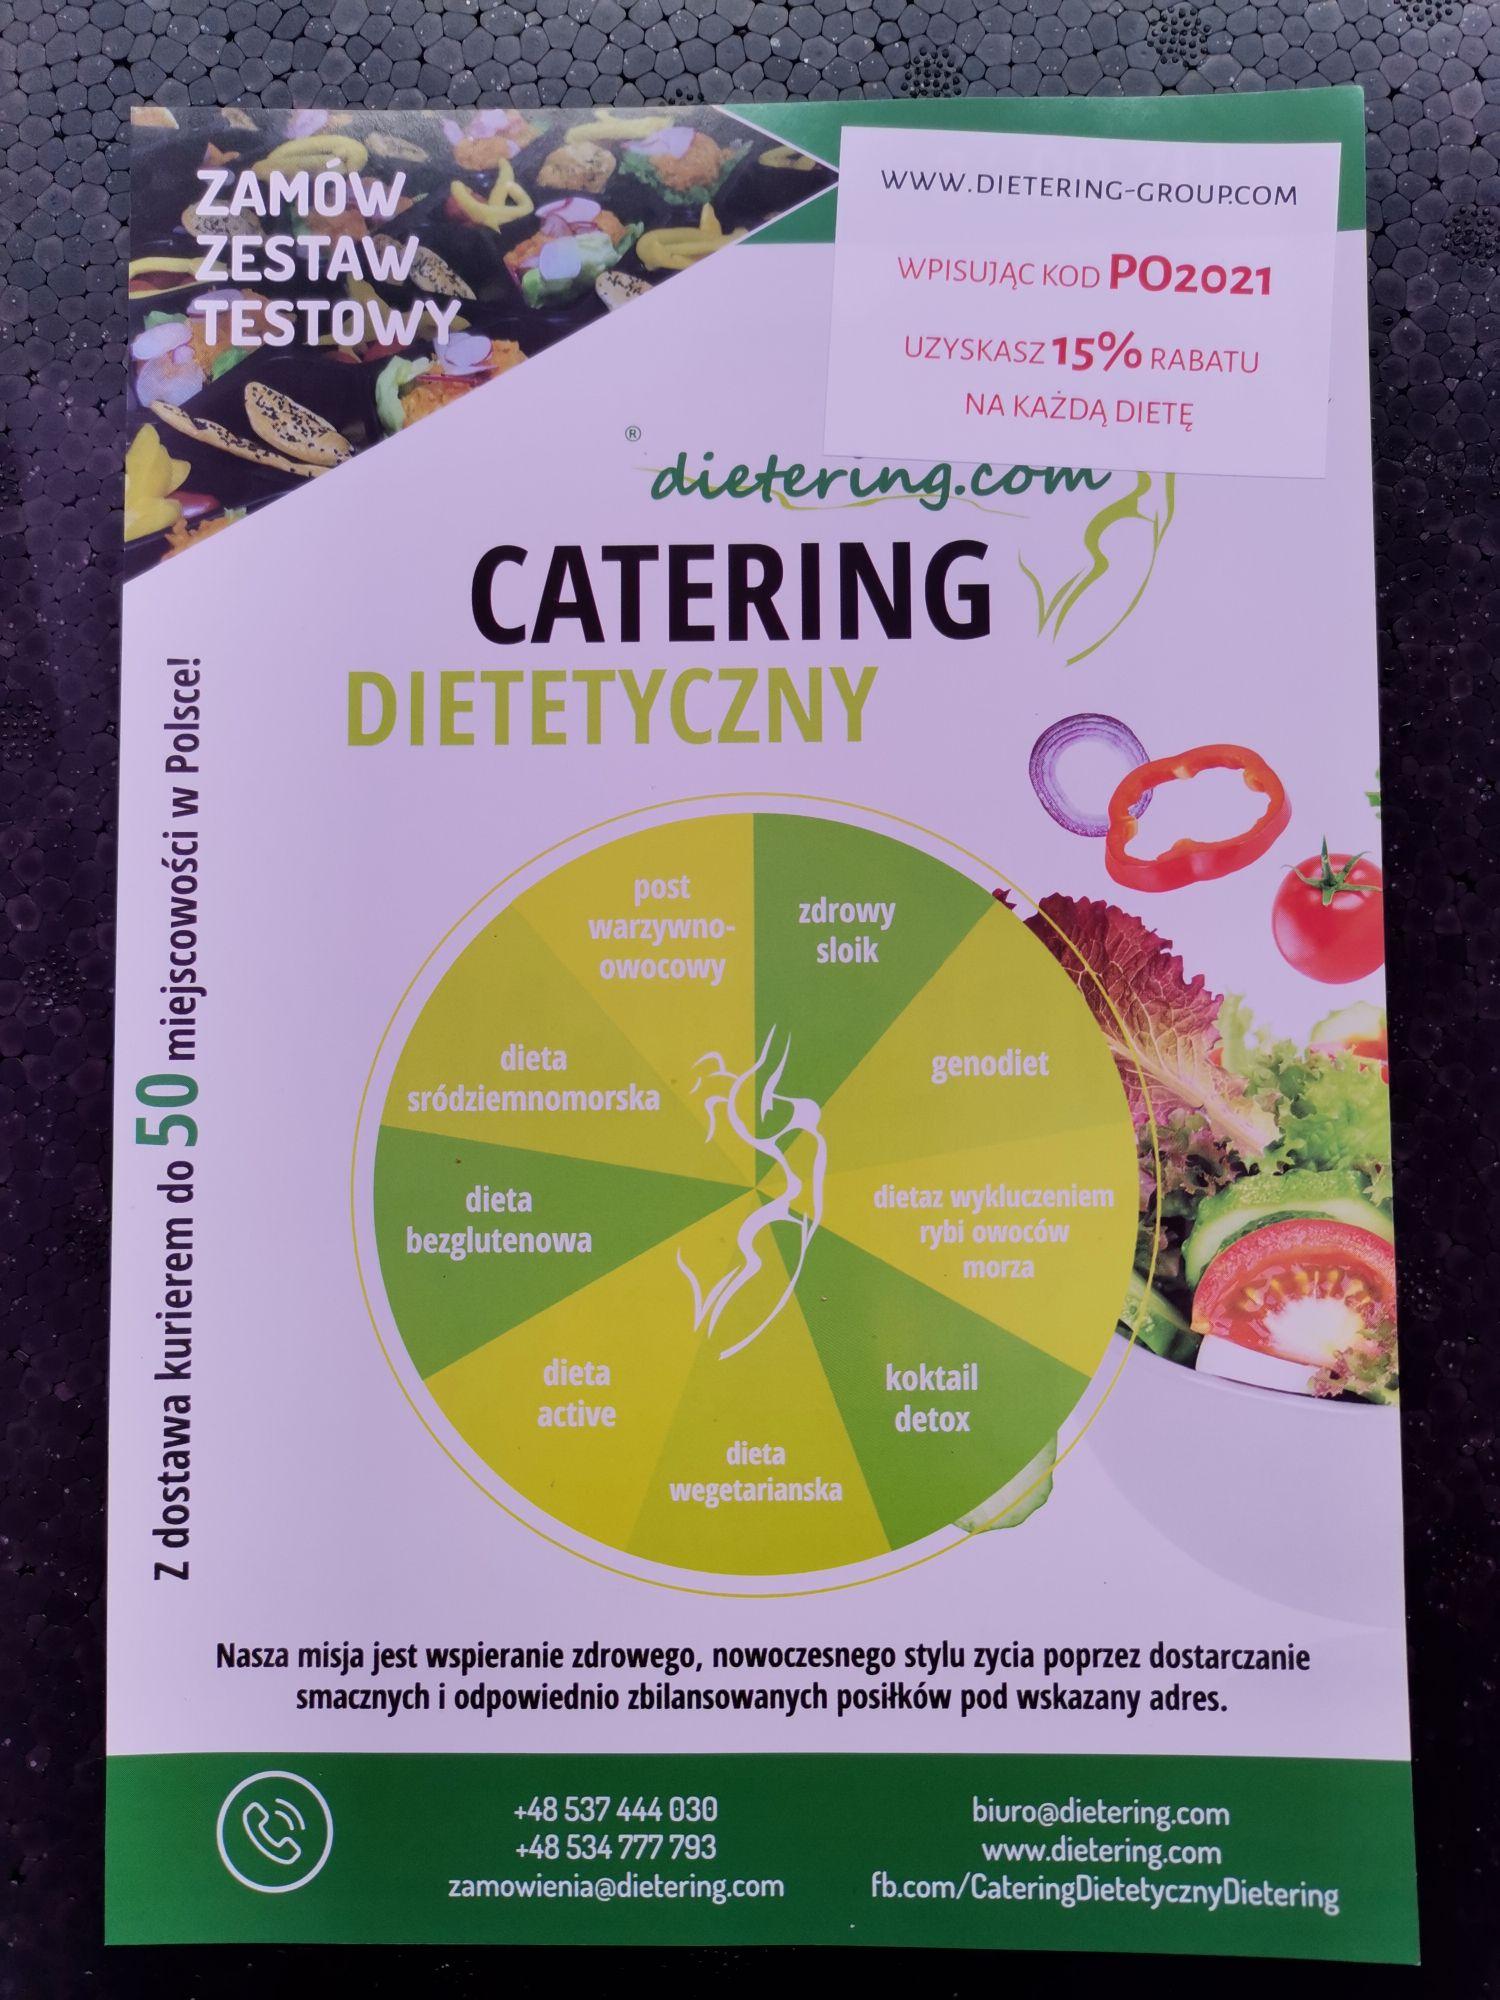 Dietering.com catering dietetyczny